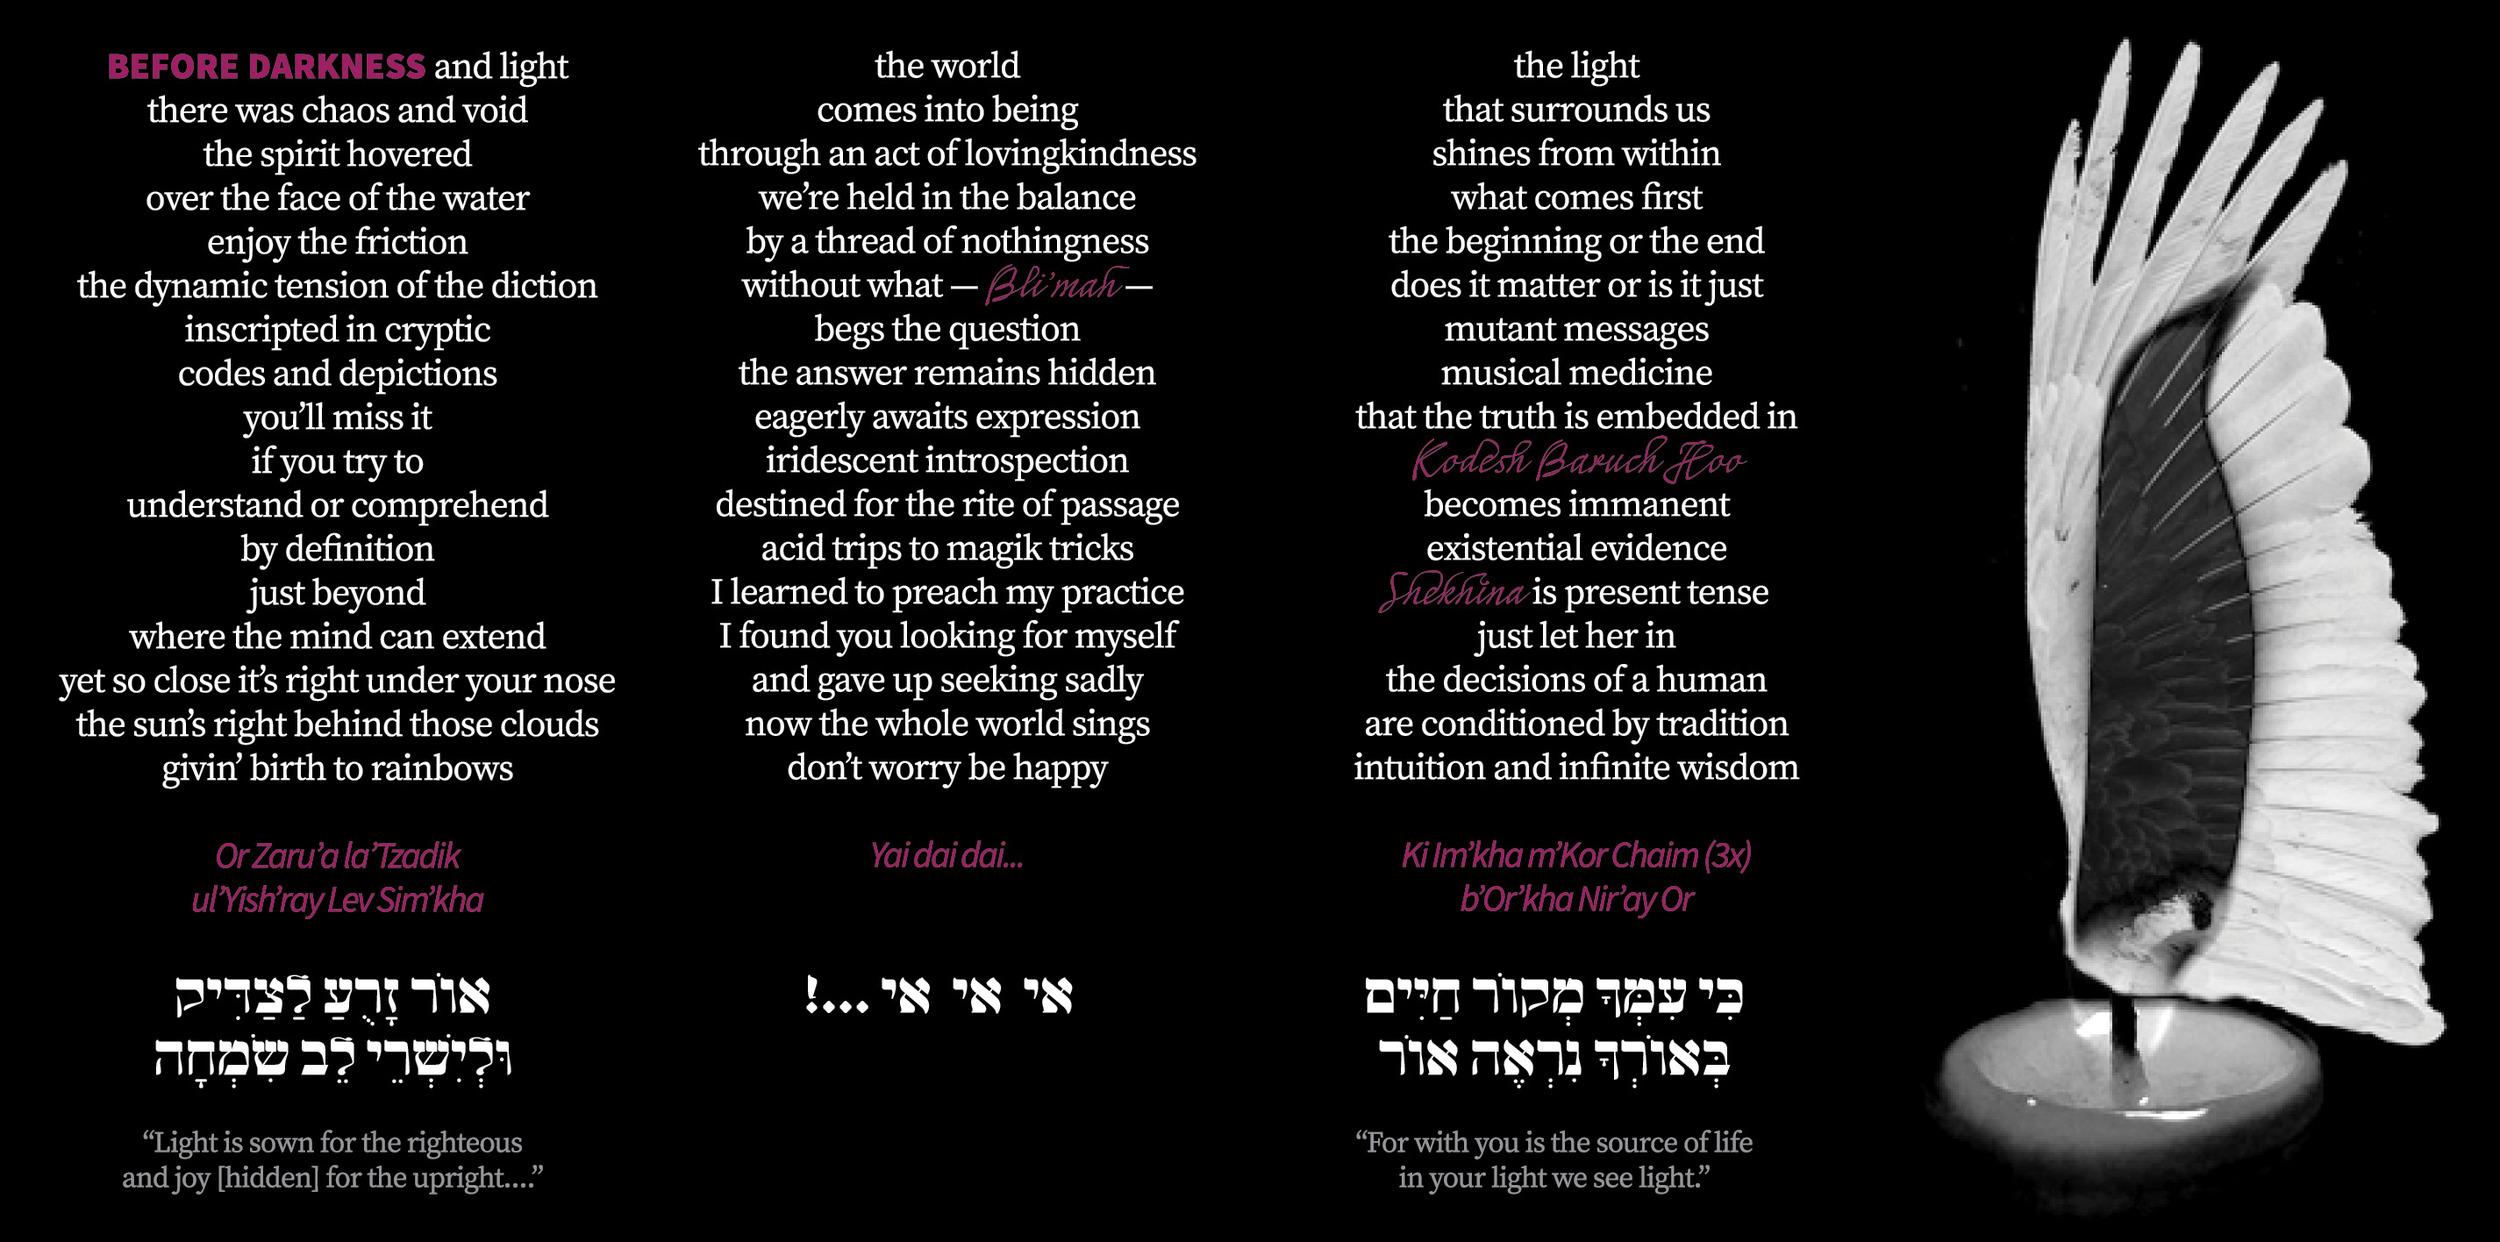 before darkness (or zarua) — darshan